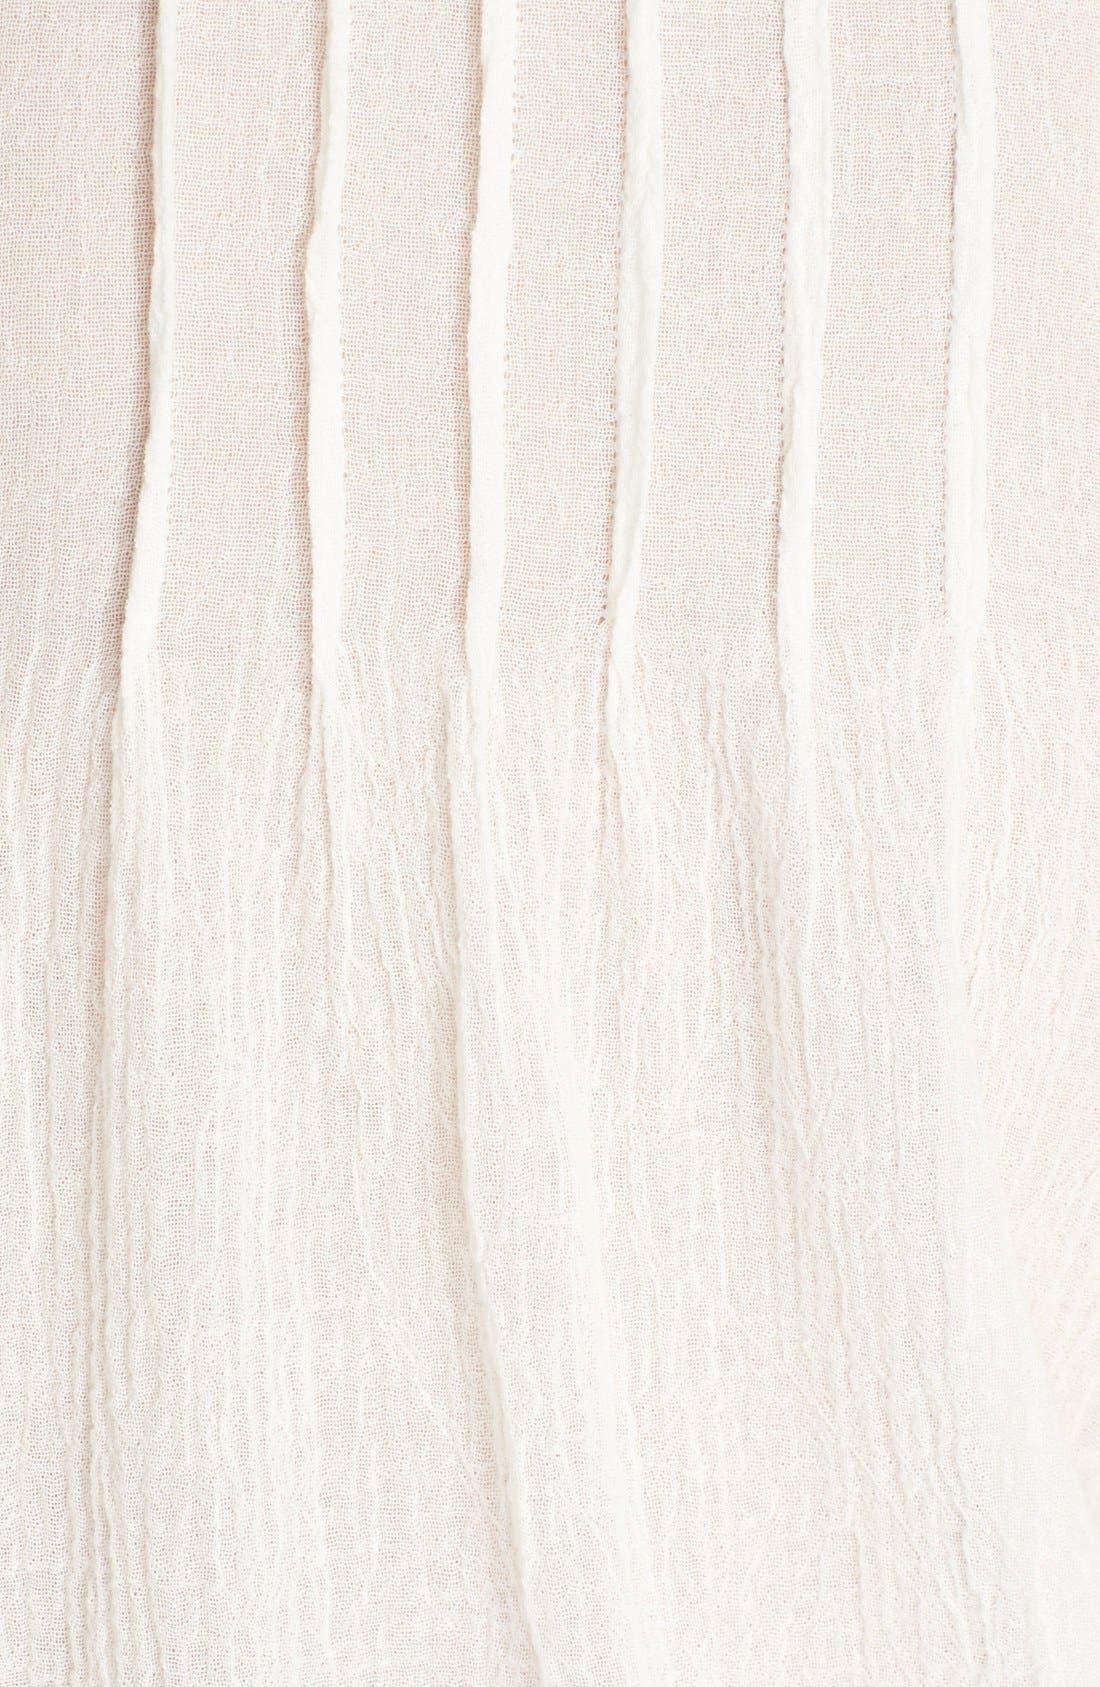 Alternate Image 3  - Joie 'Arcene' Cotton Peasant Top